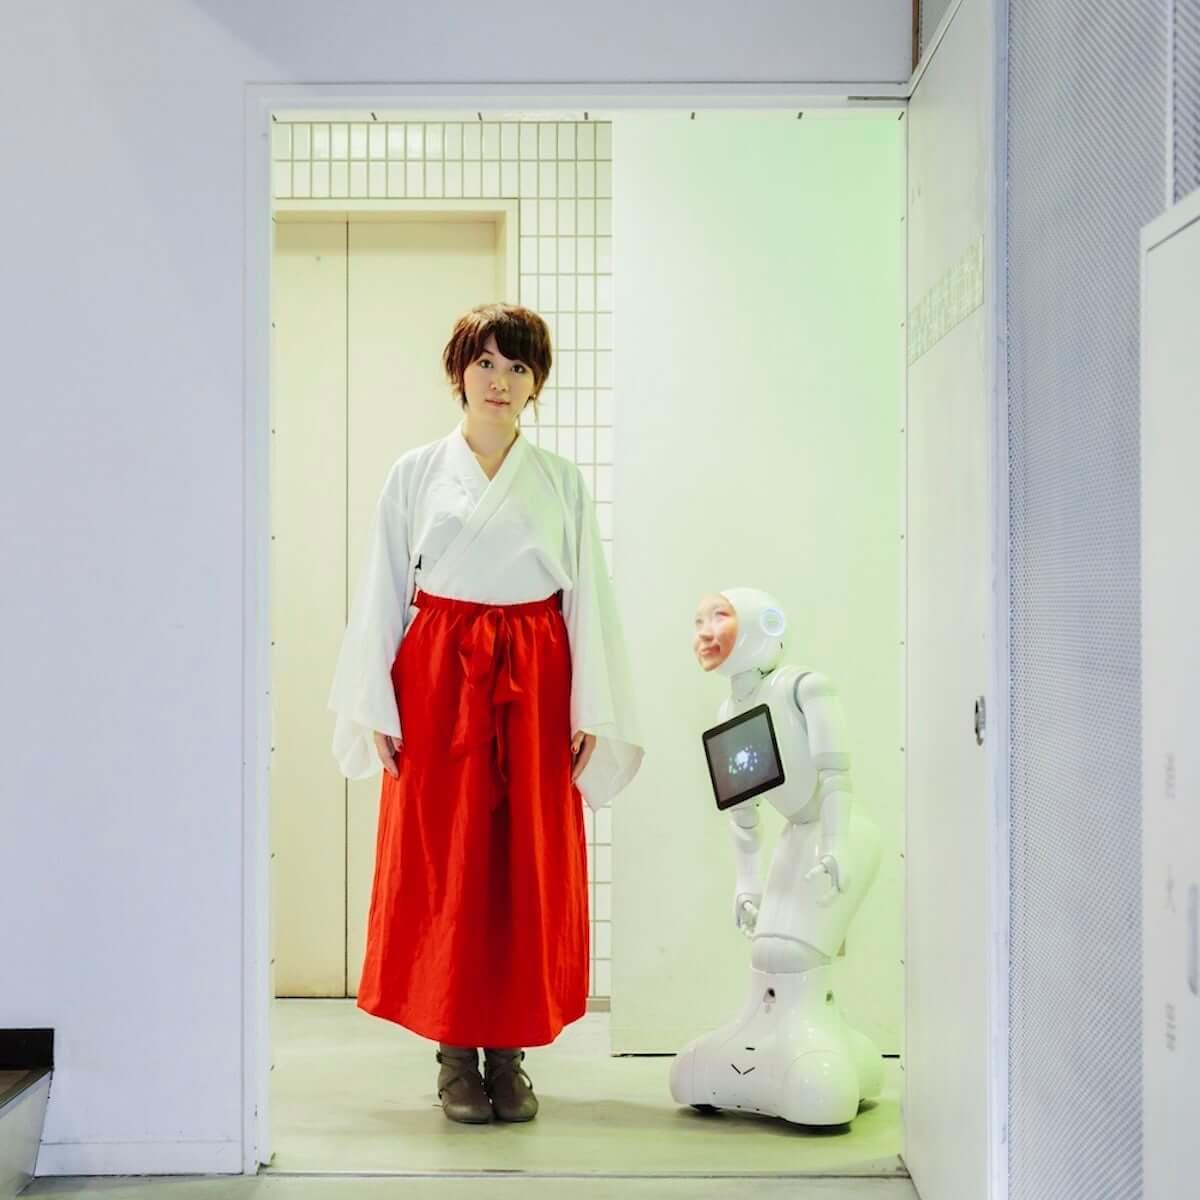 WWW、WWW Xで開催される「Alternative Tokyo」全ラインナップが発表 Etsukoichihara1_Main-1200x1200